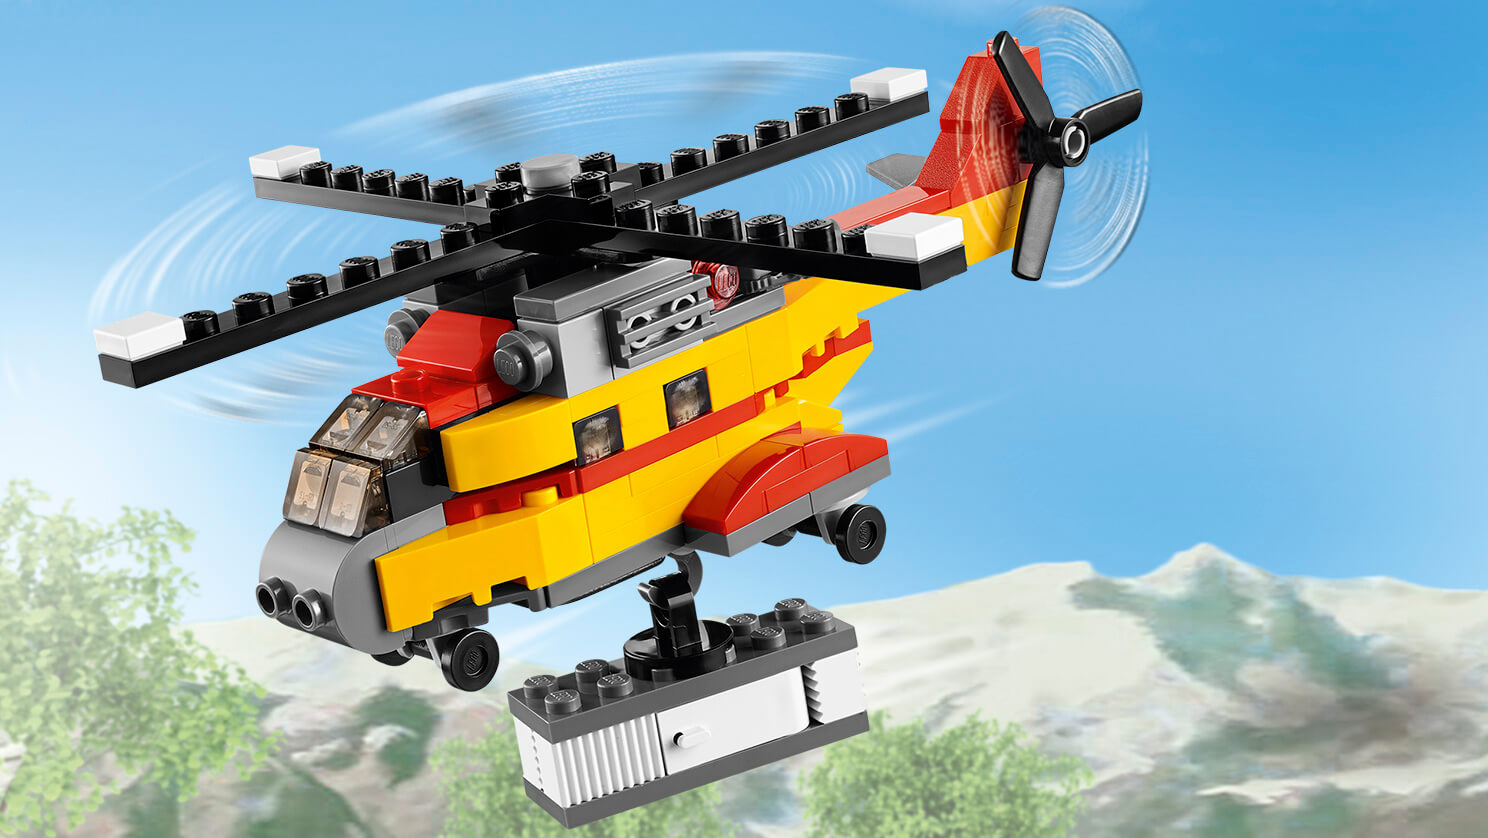 31029 L'hélicoptère cargo